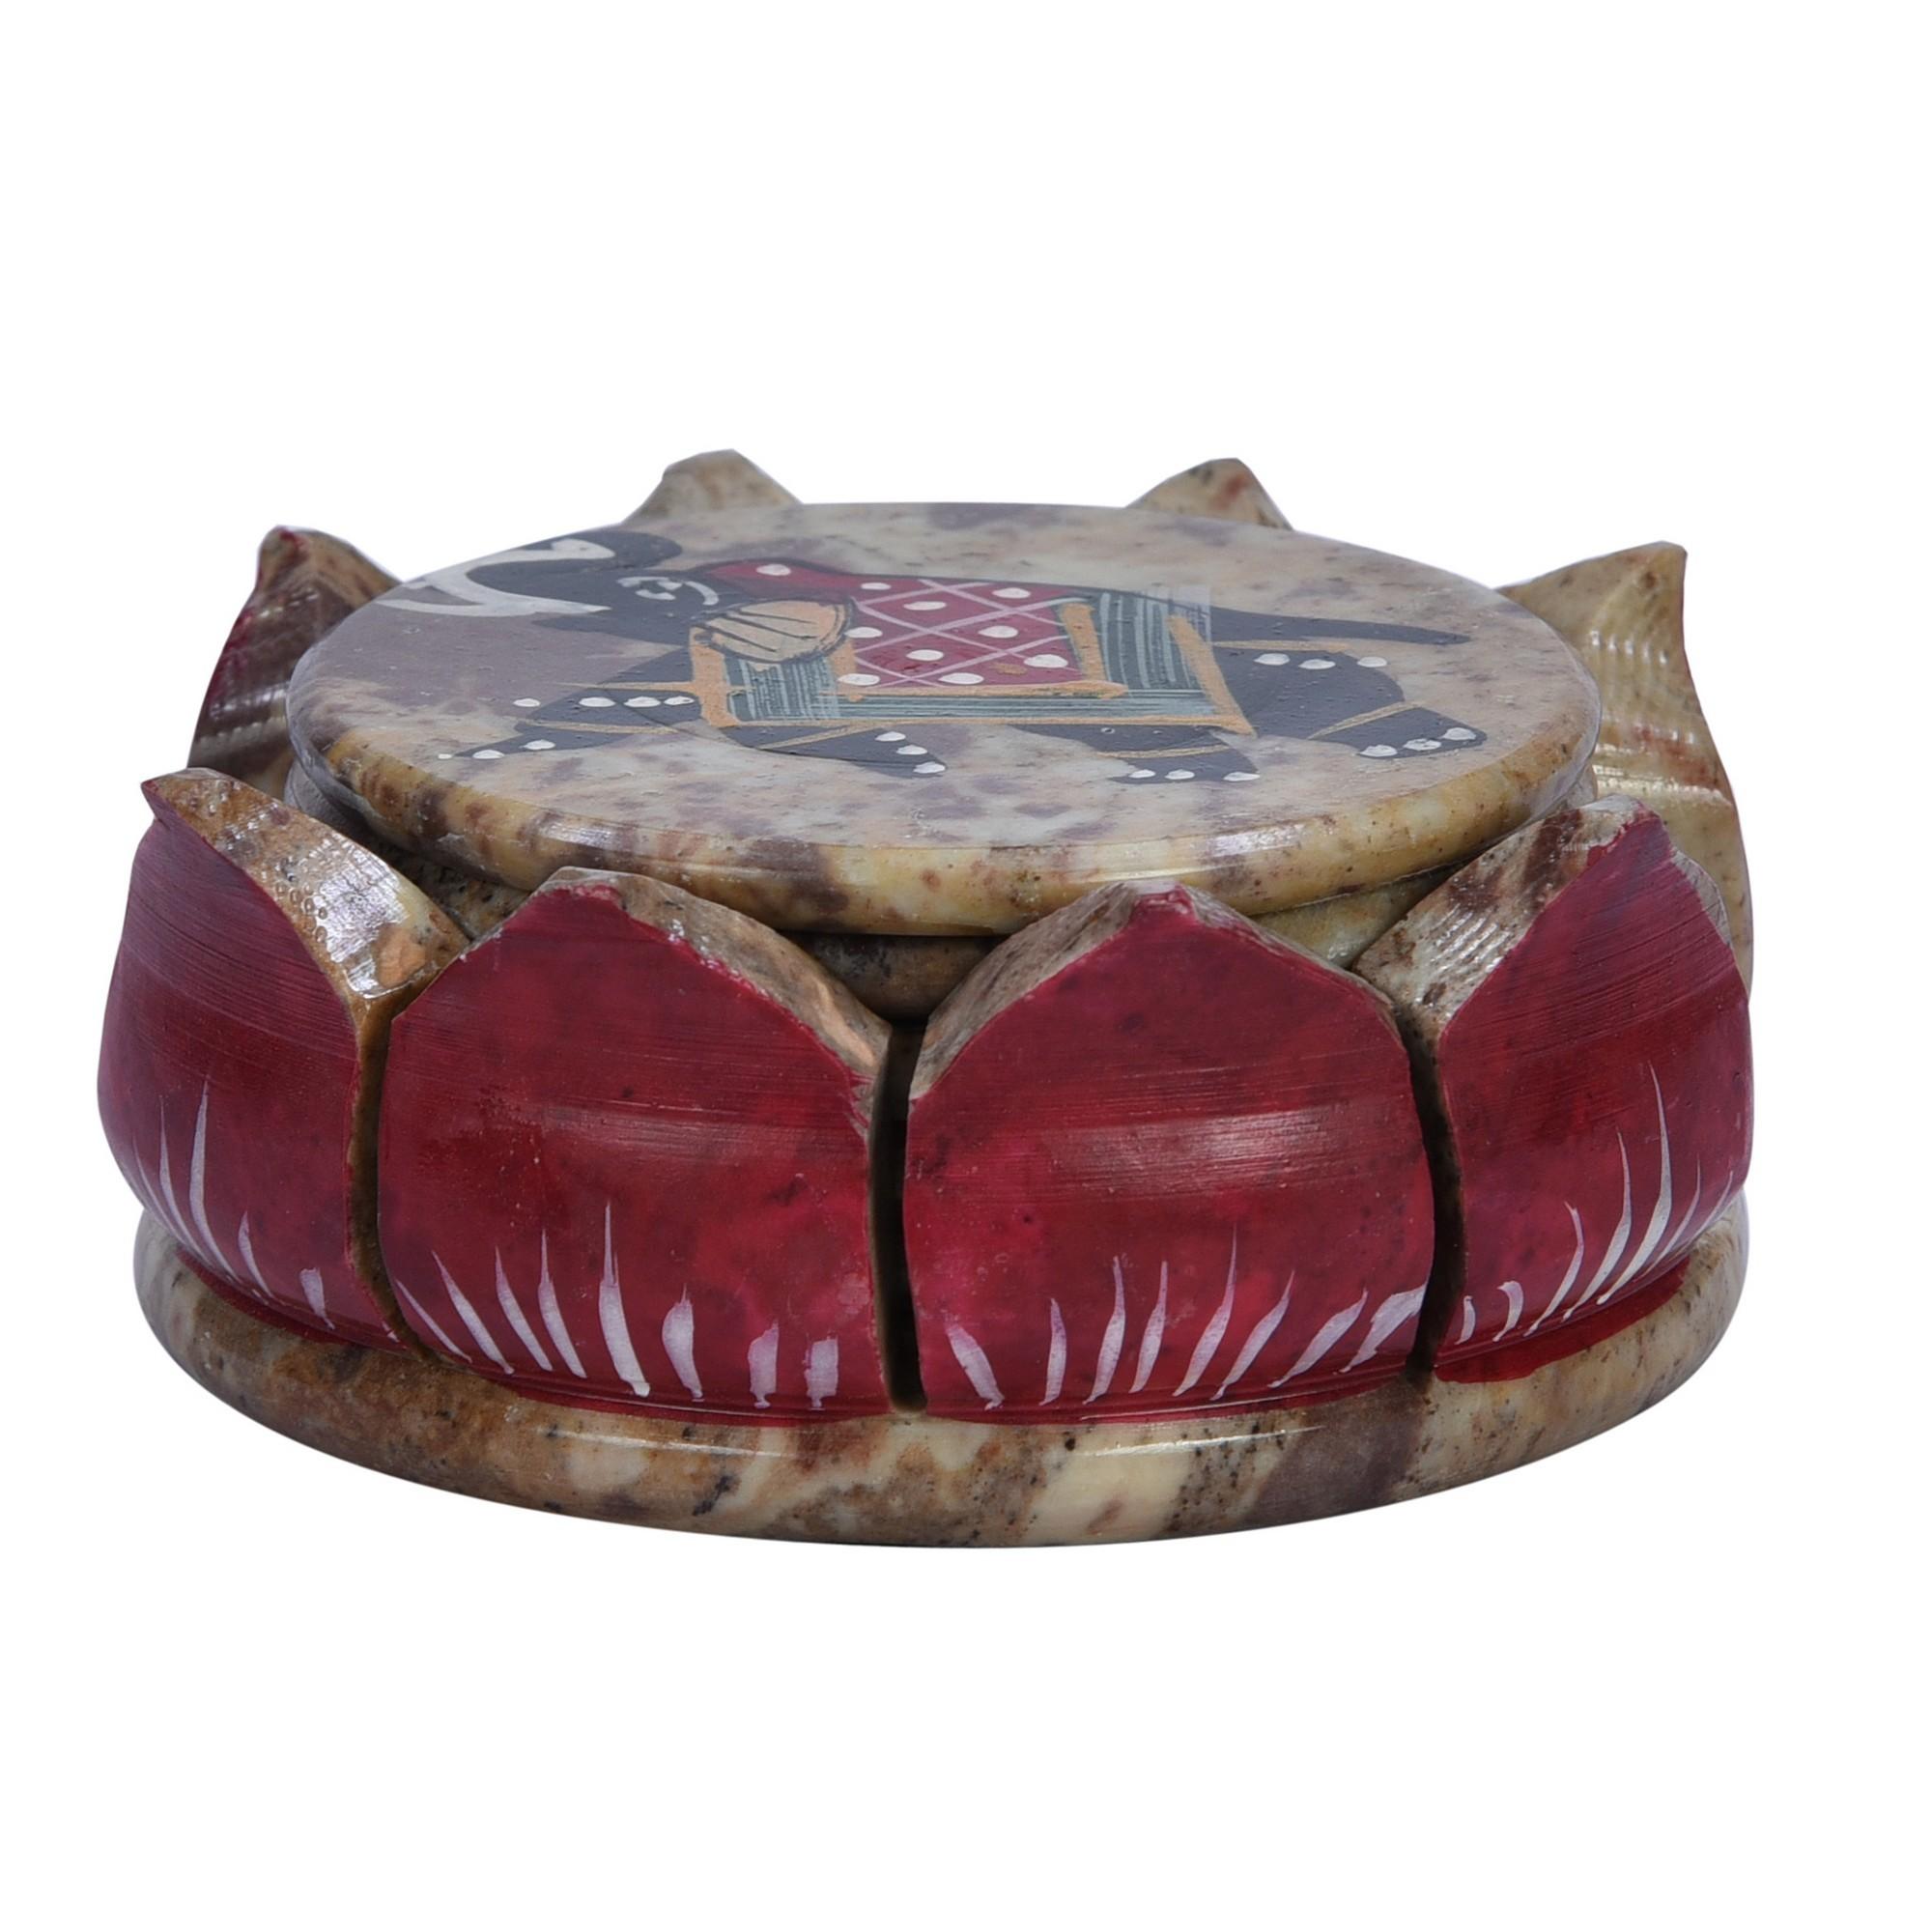 Bogan 7 Piece Hand Painted Stone Coaster Set